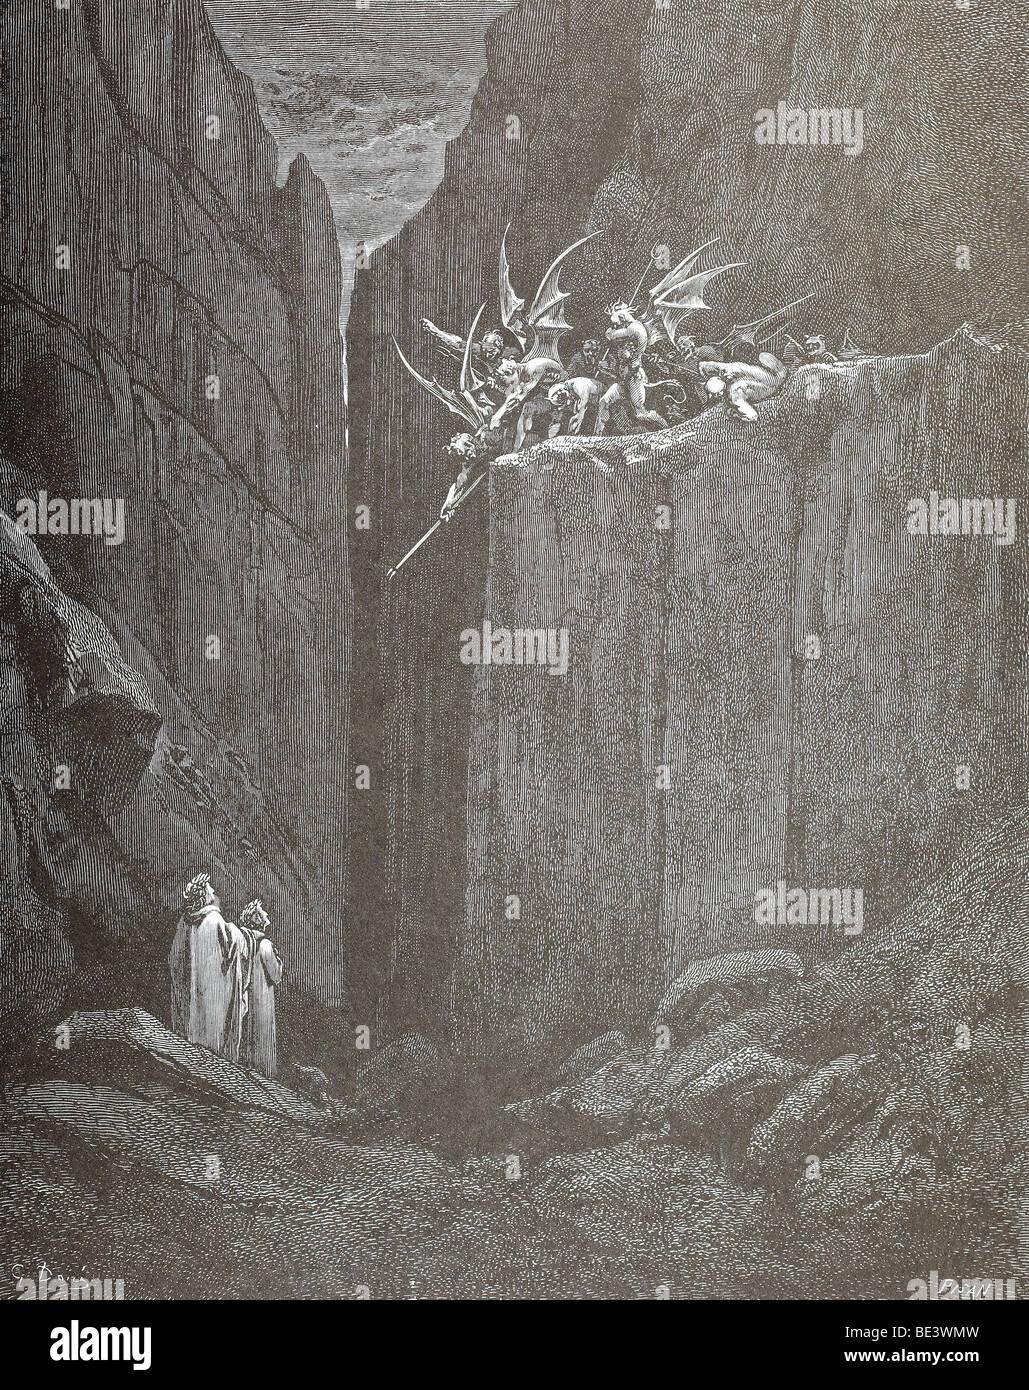 Gustave Dore's Illustration 'Tumult and Escape' from Dante's Divine Comedy - Stock Image